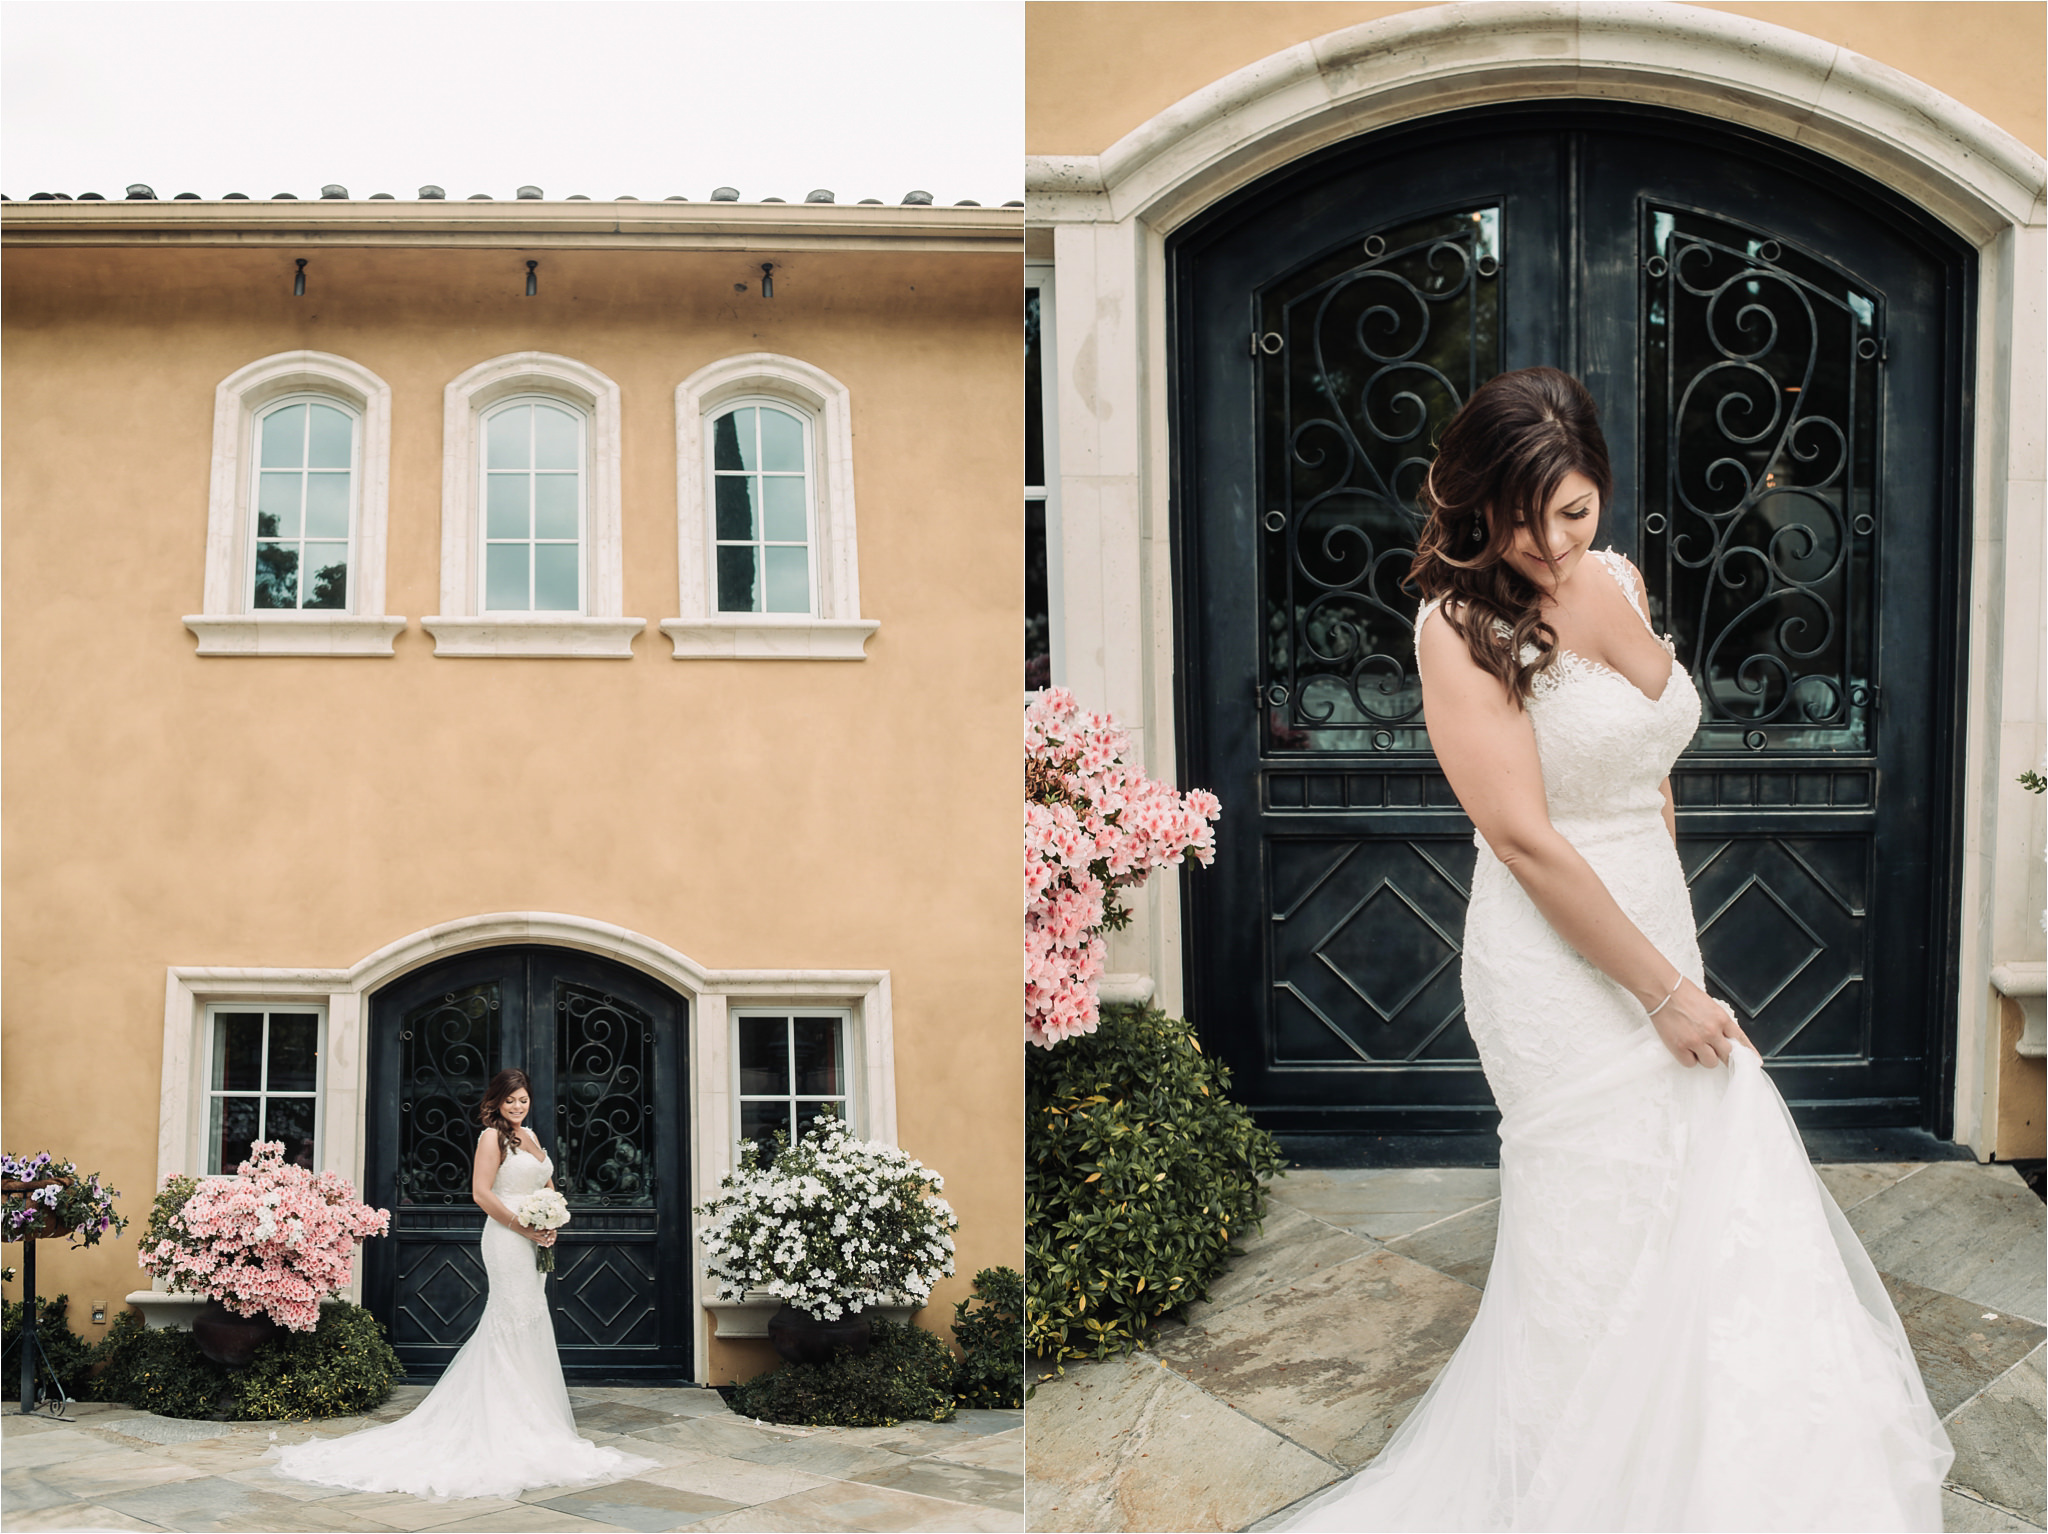 jessica-roman-photography-arden hills wedding photograpger-sacramento-boise-20.jpg